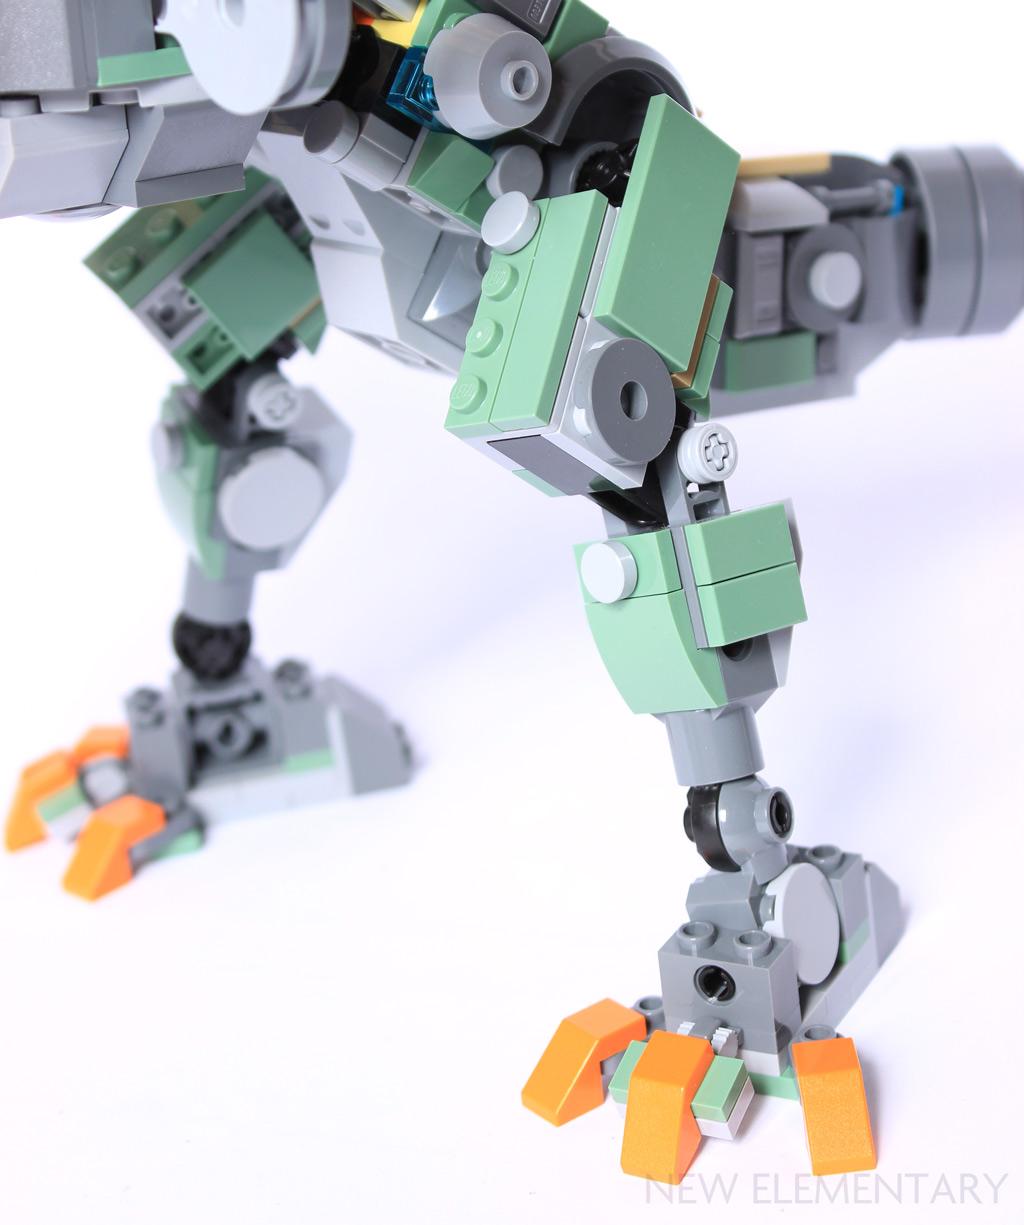 LEGO® Overwatch: Bastion alternate model   New Elementary, a LEGO